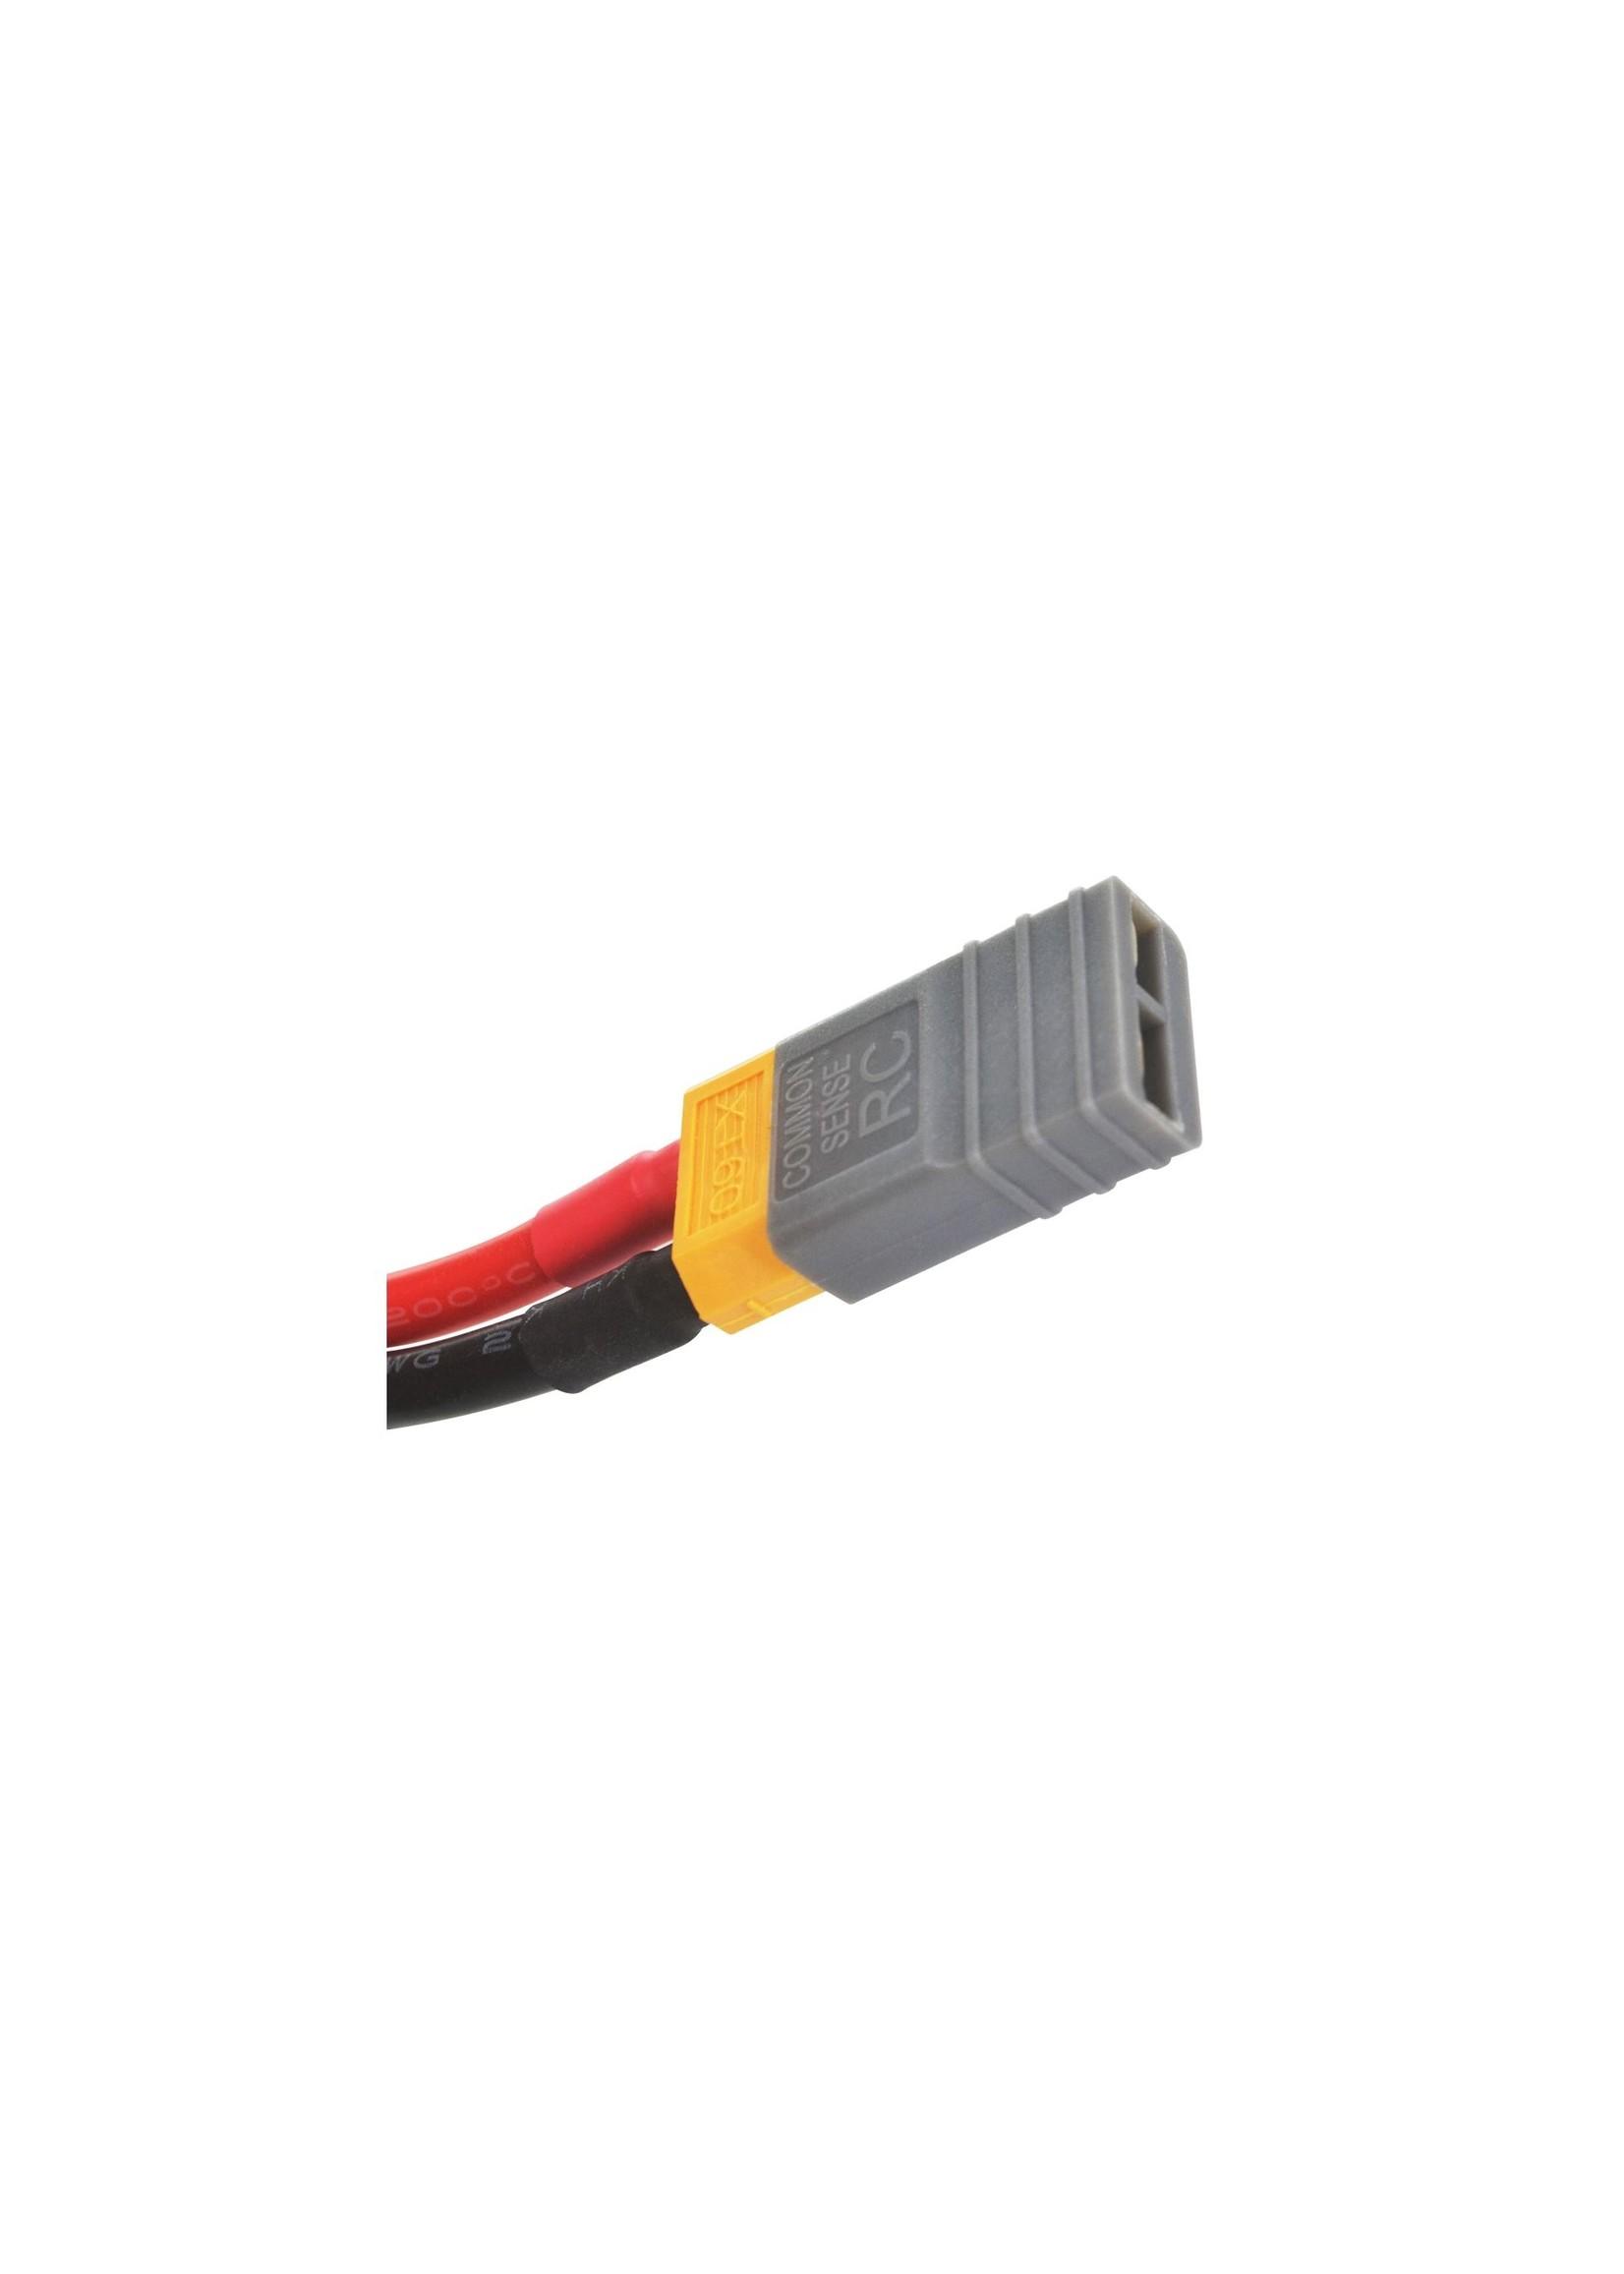 Lectron Pro CSRC4S7600-75X Lectron Pro 14.8V 7600mAh 75C Hard Case Lipo Battery with XT60 Connector